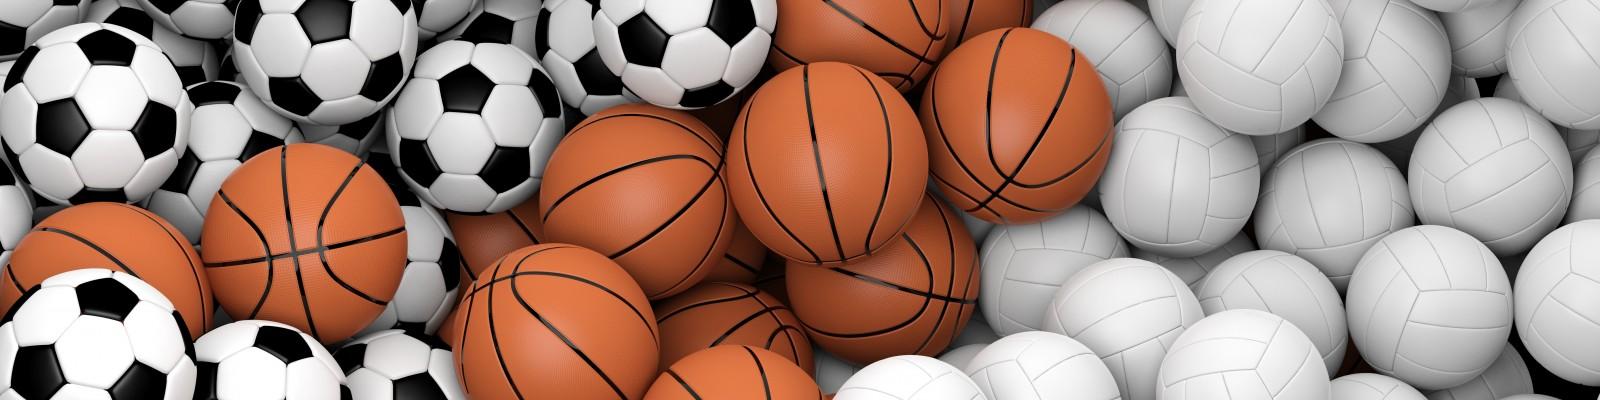 Balls_mixed